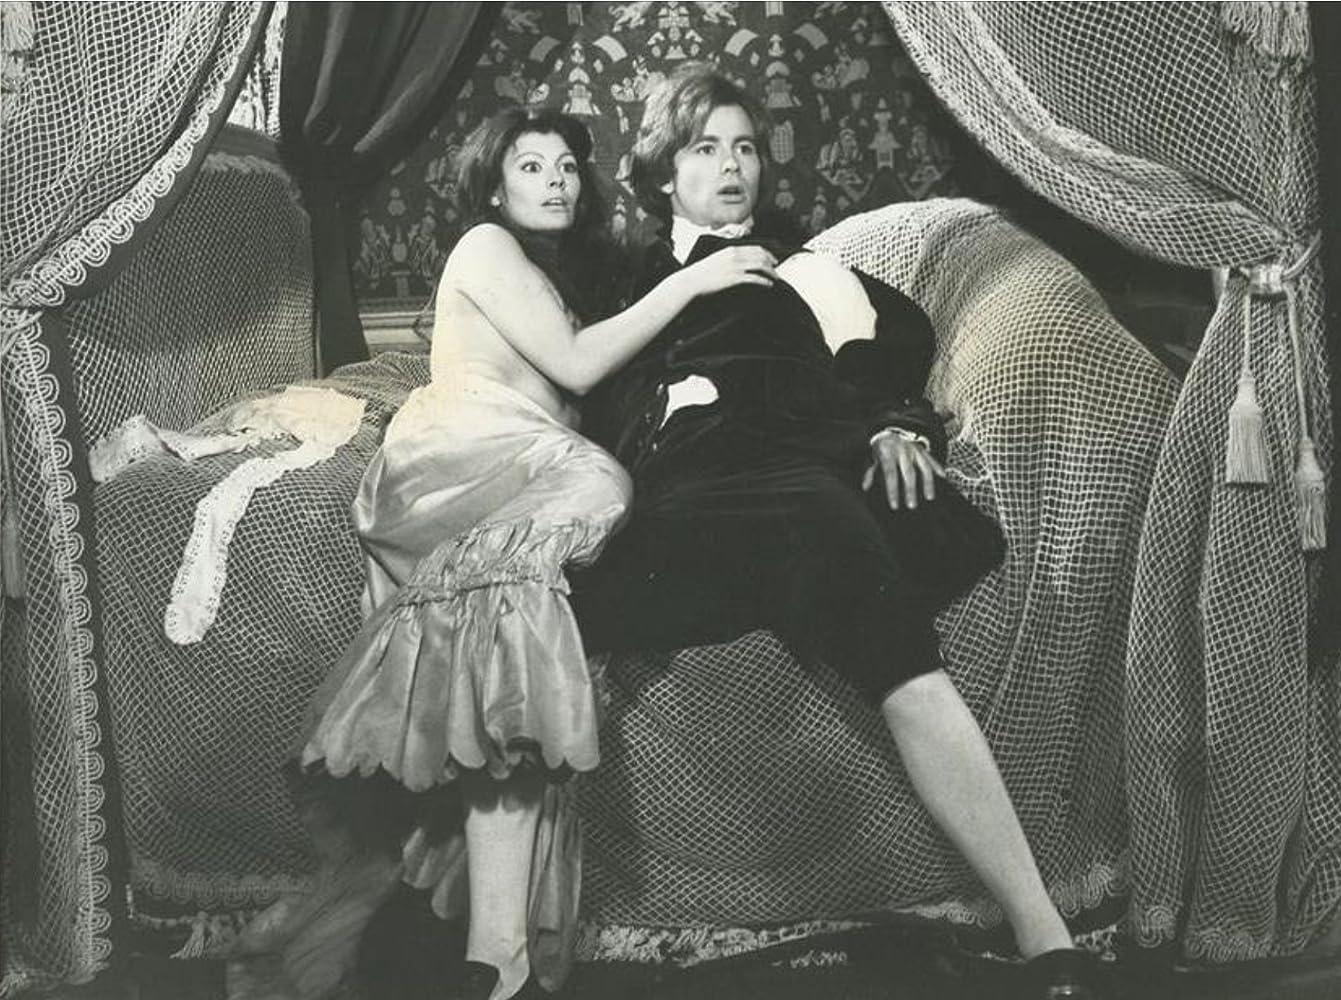 Barbara Mitchell,Maria Teresa Carlson (1963?001) XXX photos Luciana Paluzzi (born 1937),Gordon James (1878?949)